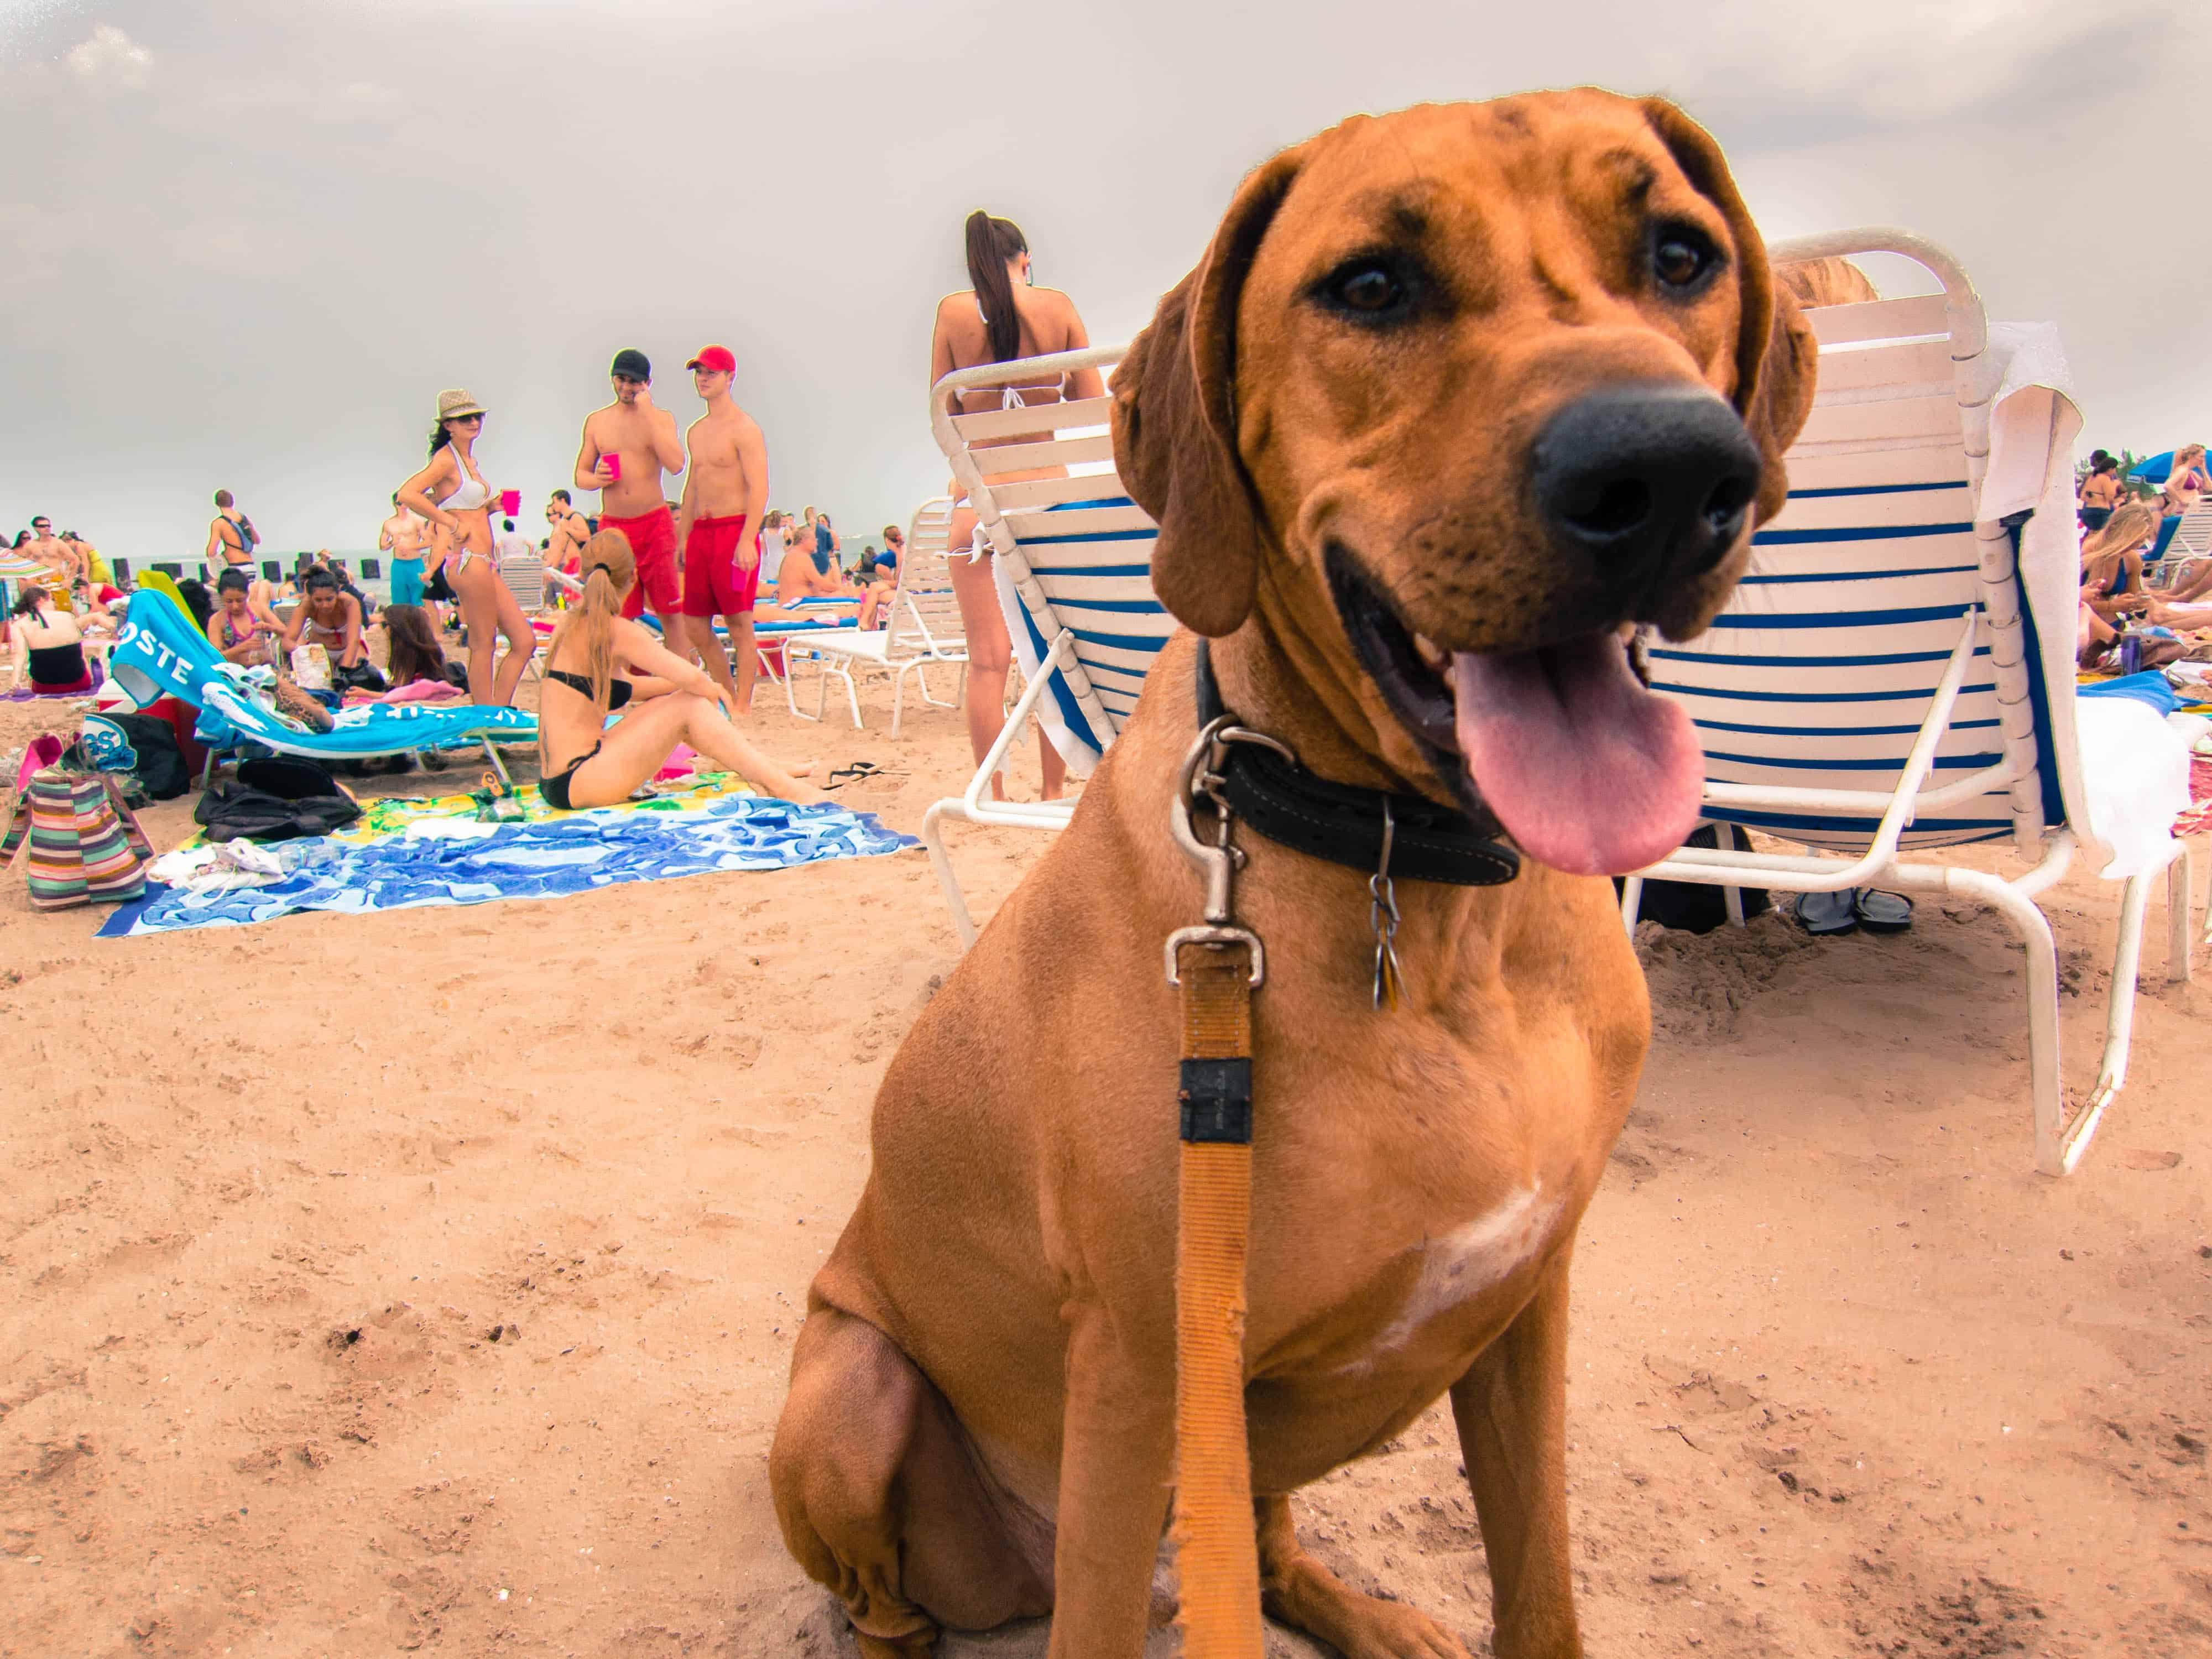 Rhodesian Ridgeback, pet adventure, dog blog, marking our territory, dog beach